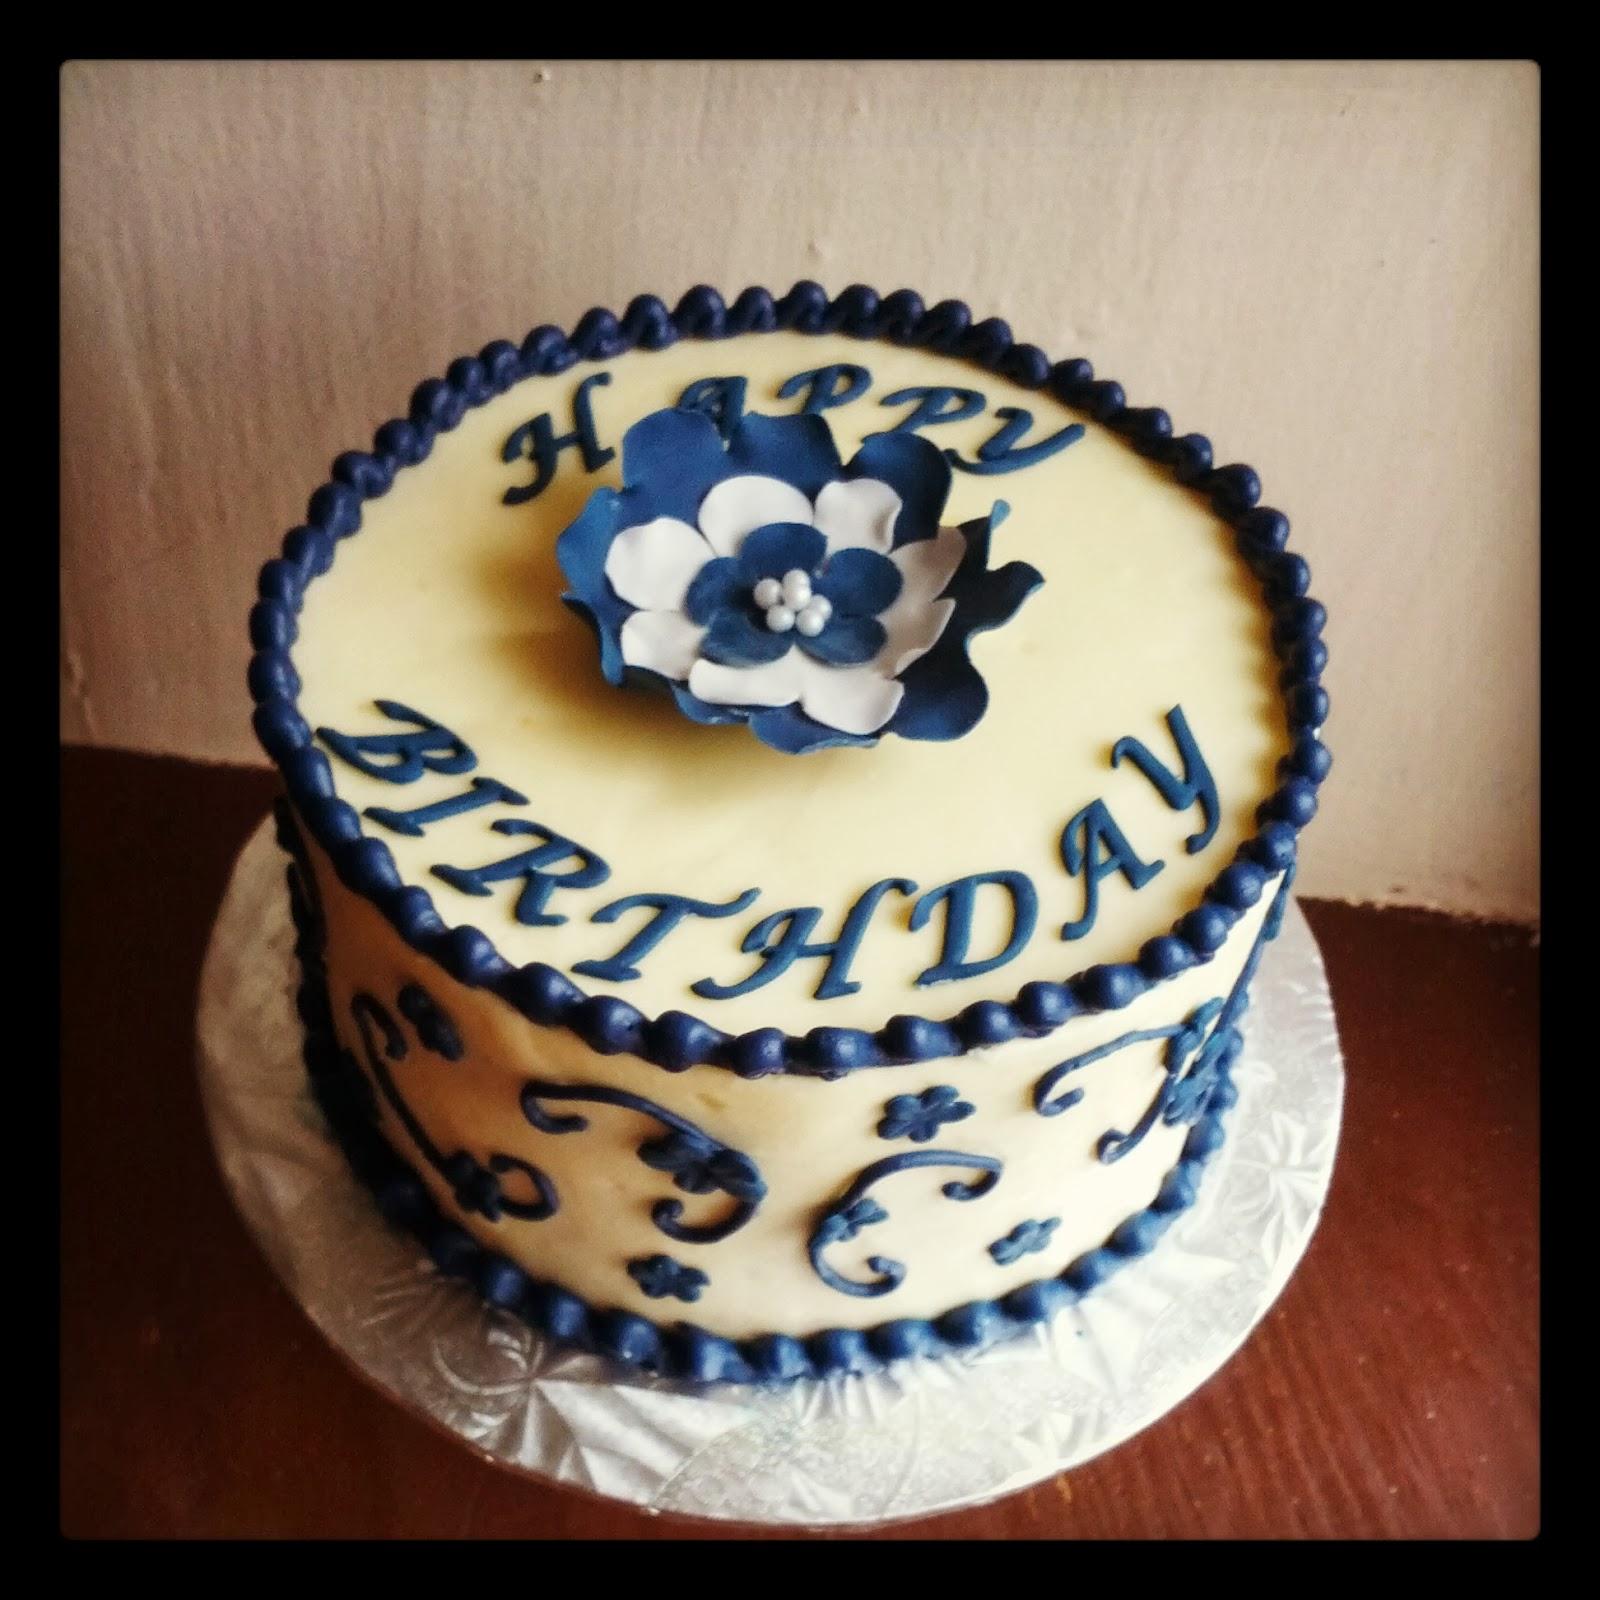 Second Generation Cake Design: Blue Birthday Cake